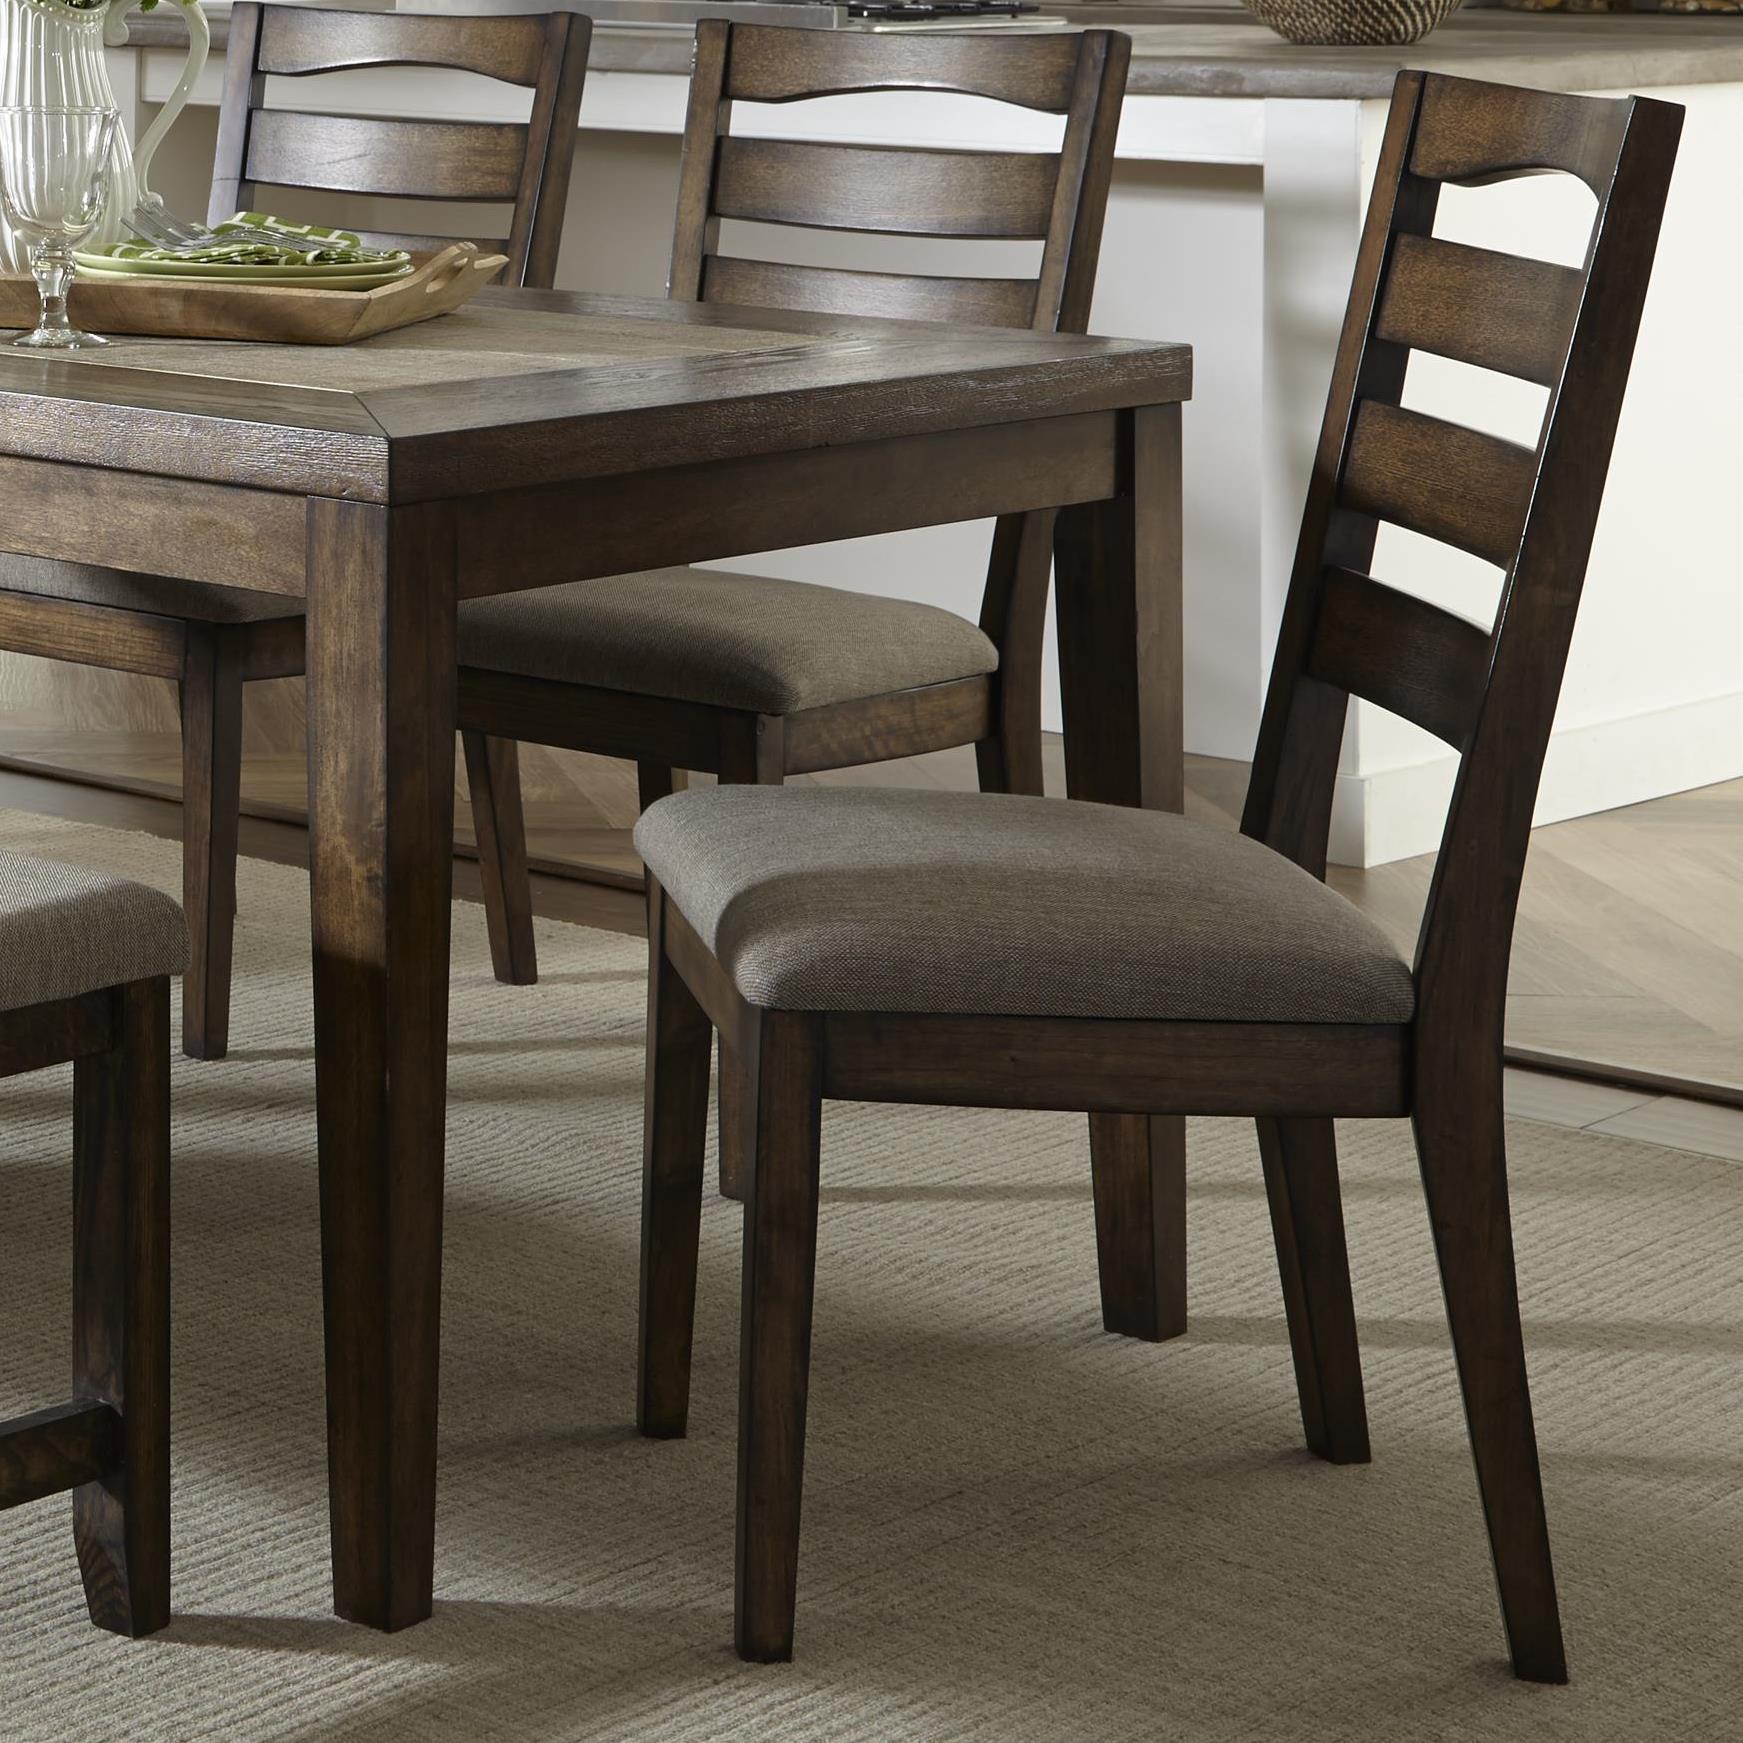 Progressive Furniture Forest Brook Dining Chair - Item Number: P378D-61